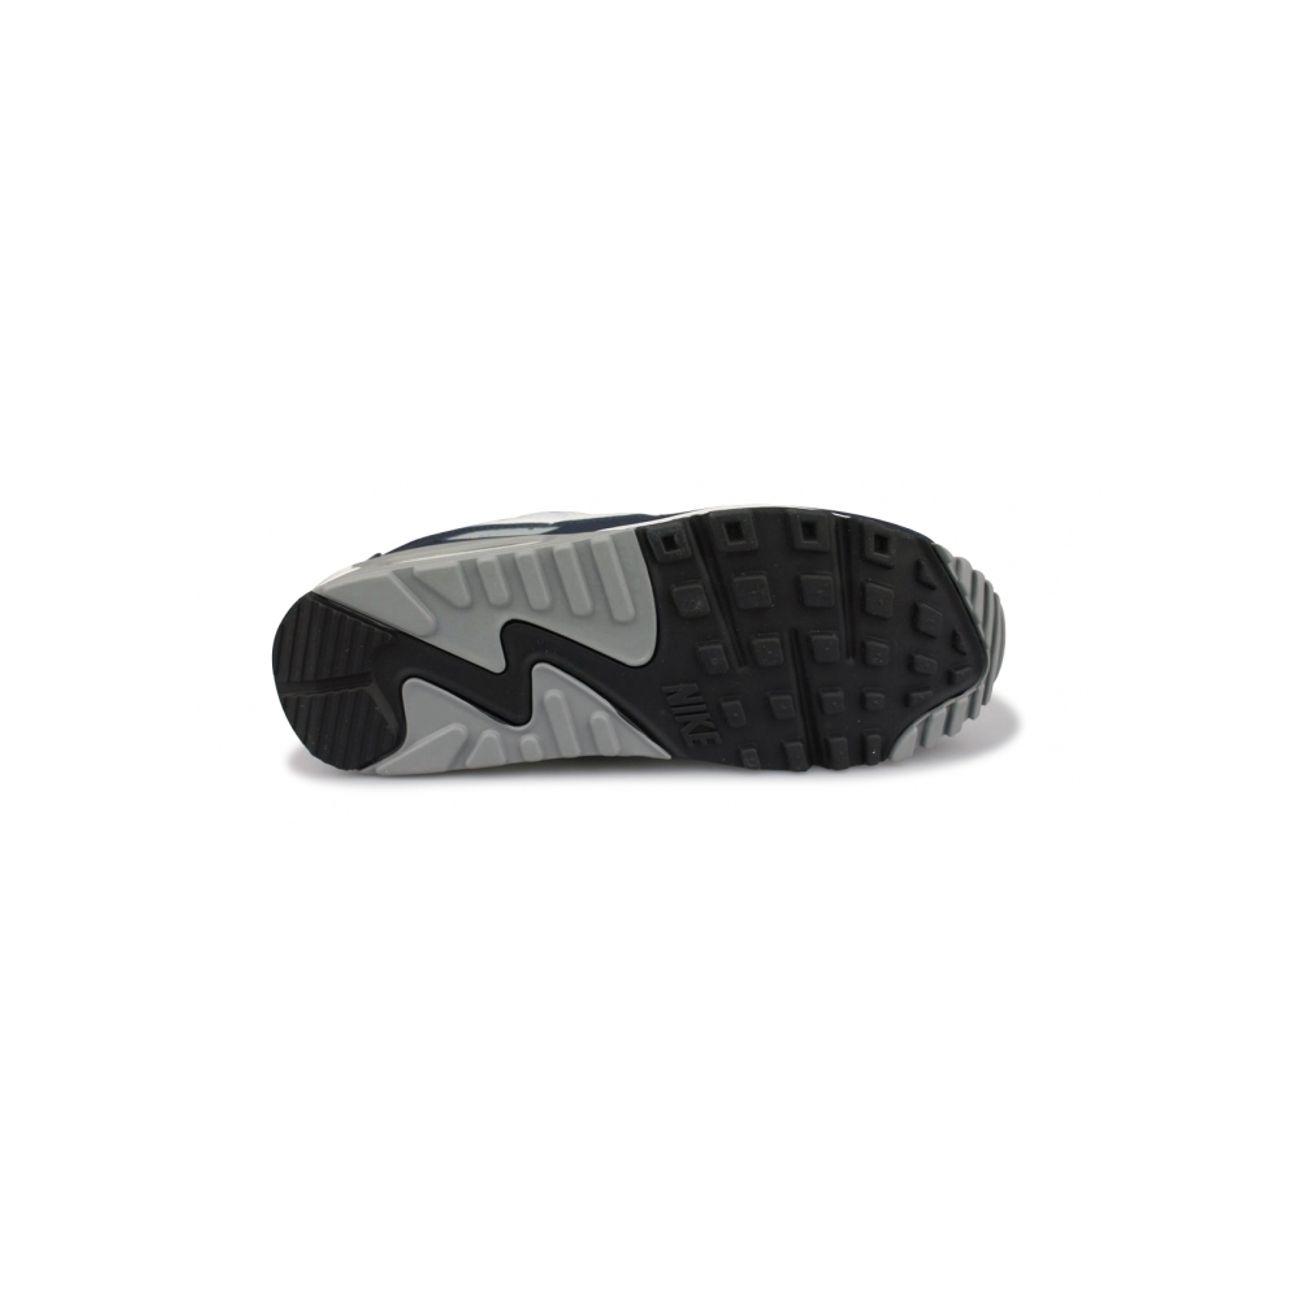 homme NIKE Basket Nike Air Max 90 Blanc Ct4352-100